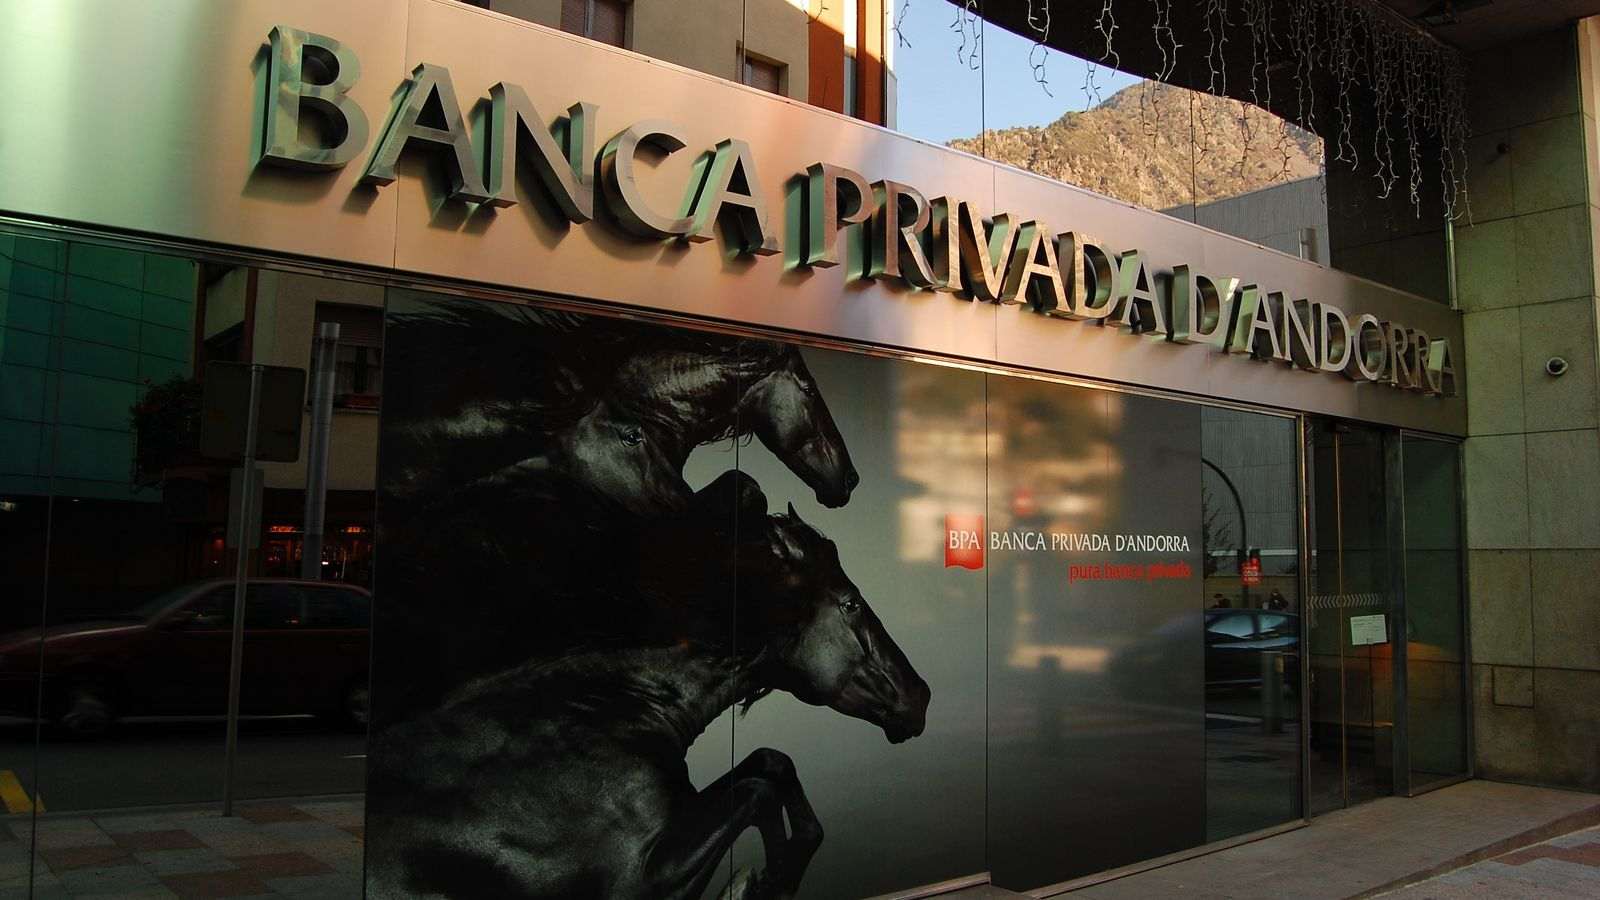 Oficina de Banca Privada d'Andorra. / ARXIU ARA